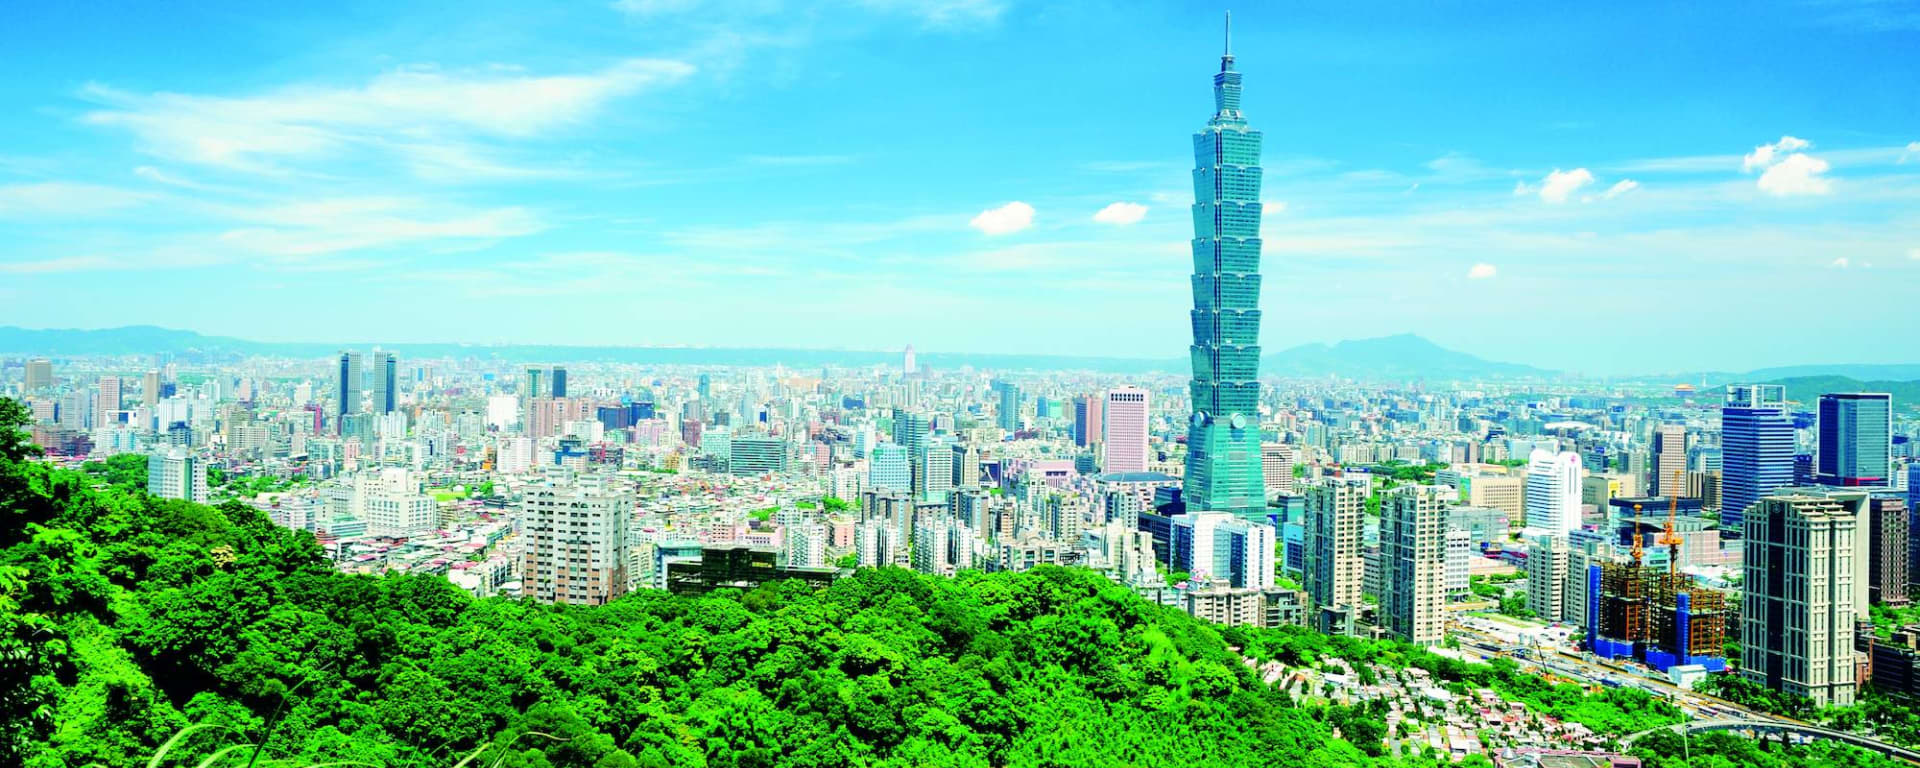 Voyages en Taïwan | Vacances en Asie par tourasia: Taipei 101 Building